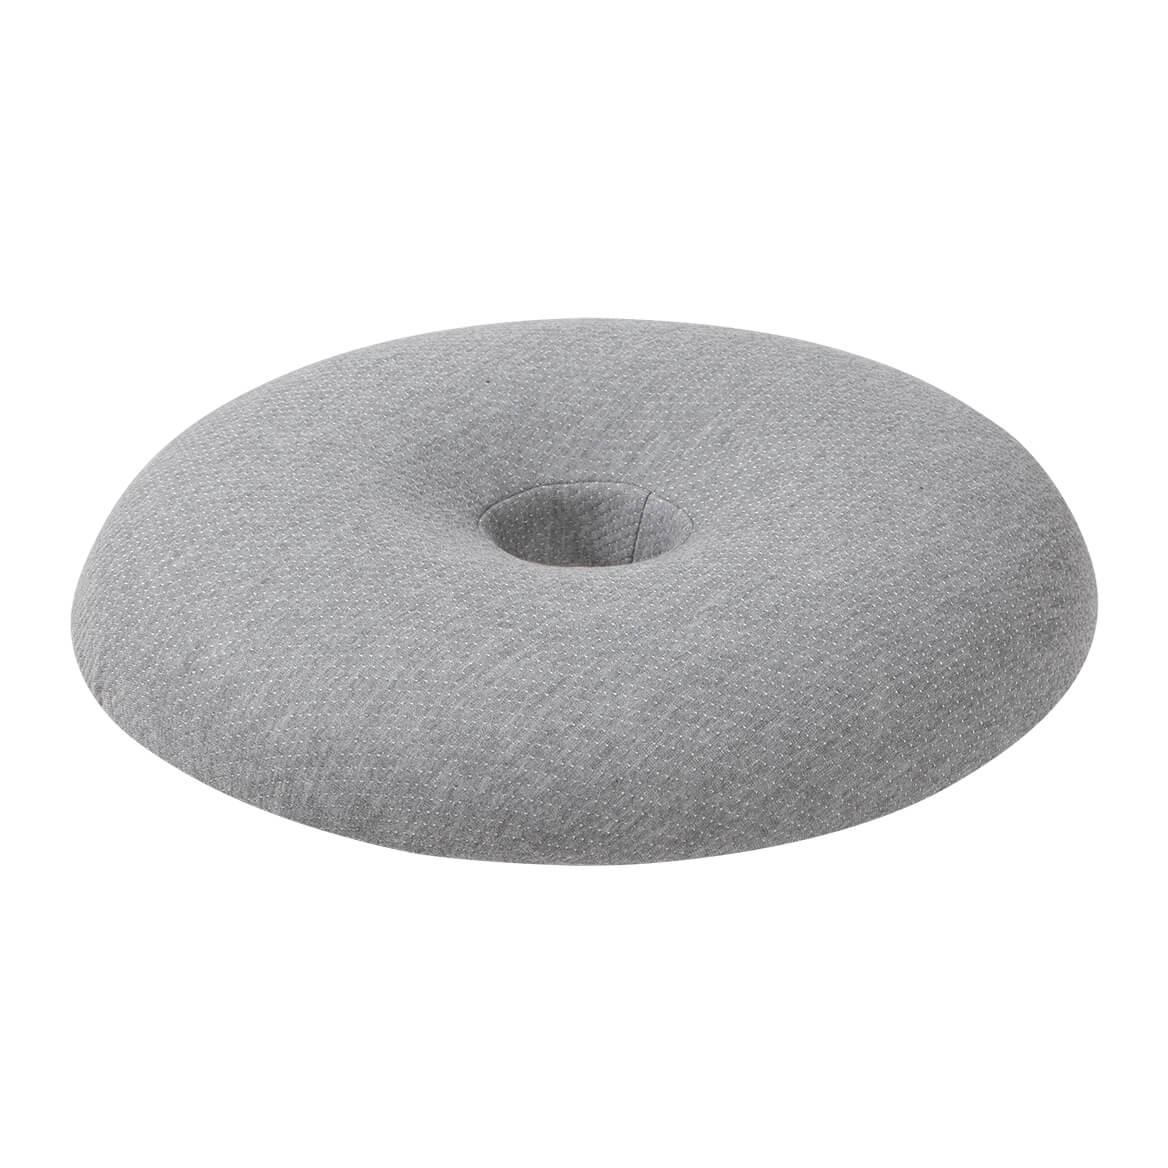 Pressure Free Donut Cushion-369803